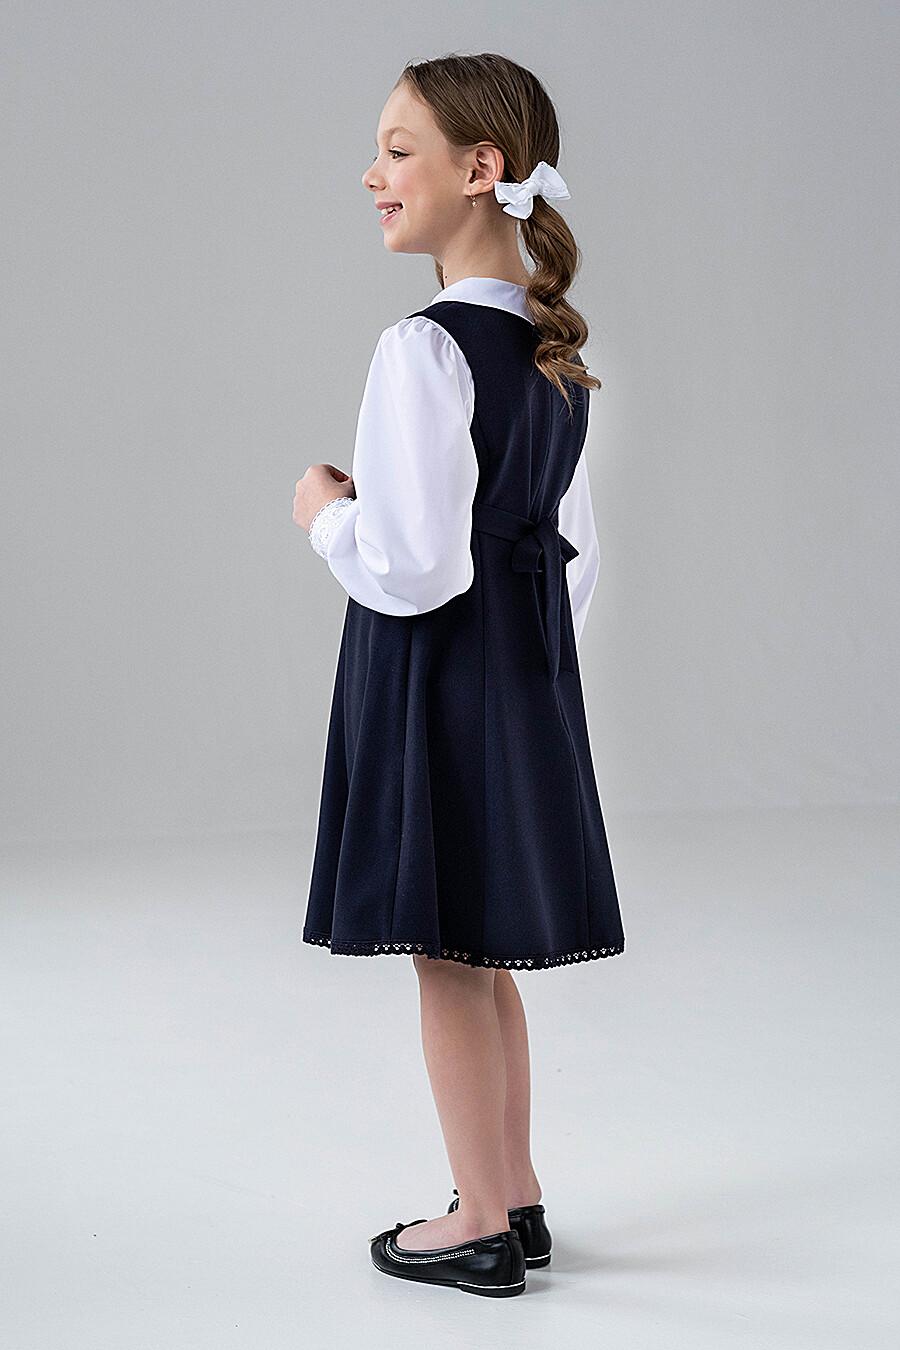 Сарафан ALOLIKA (666067), купить в Moyo.moda